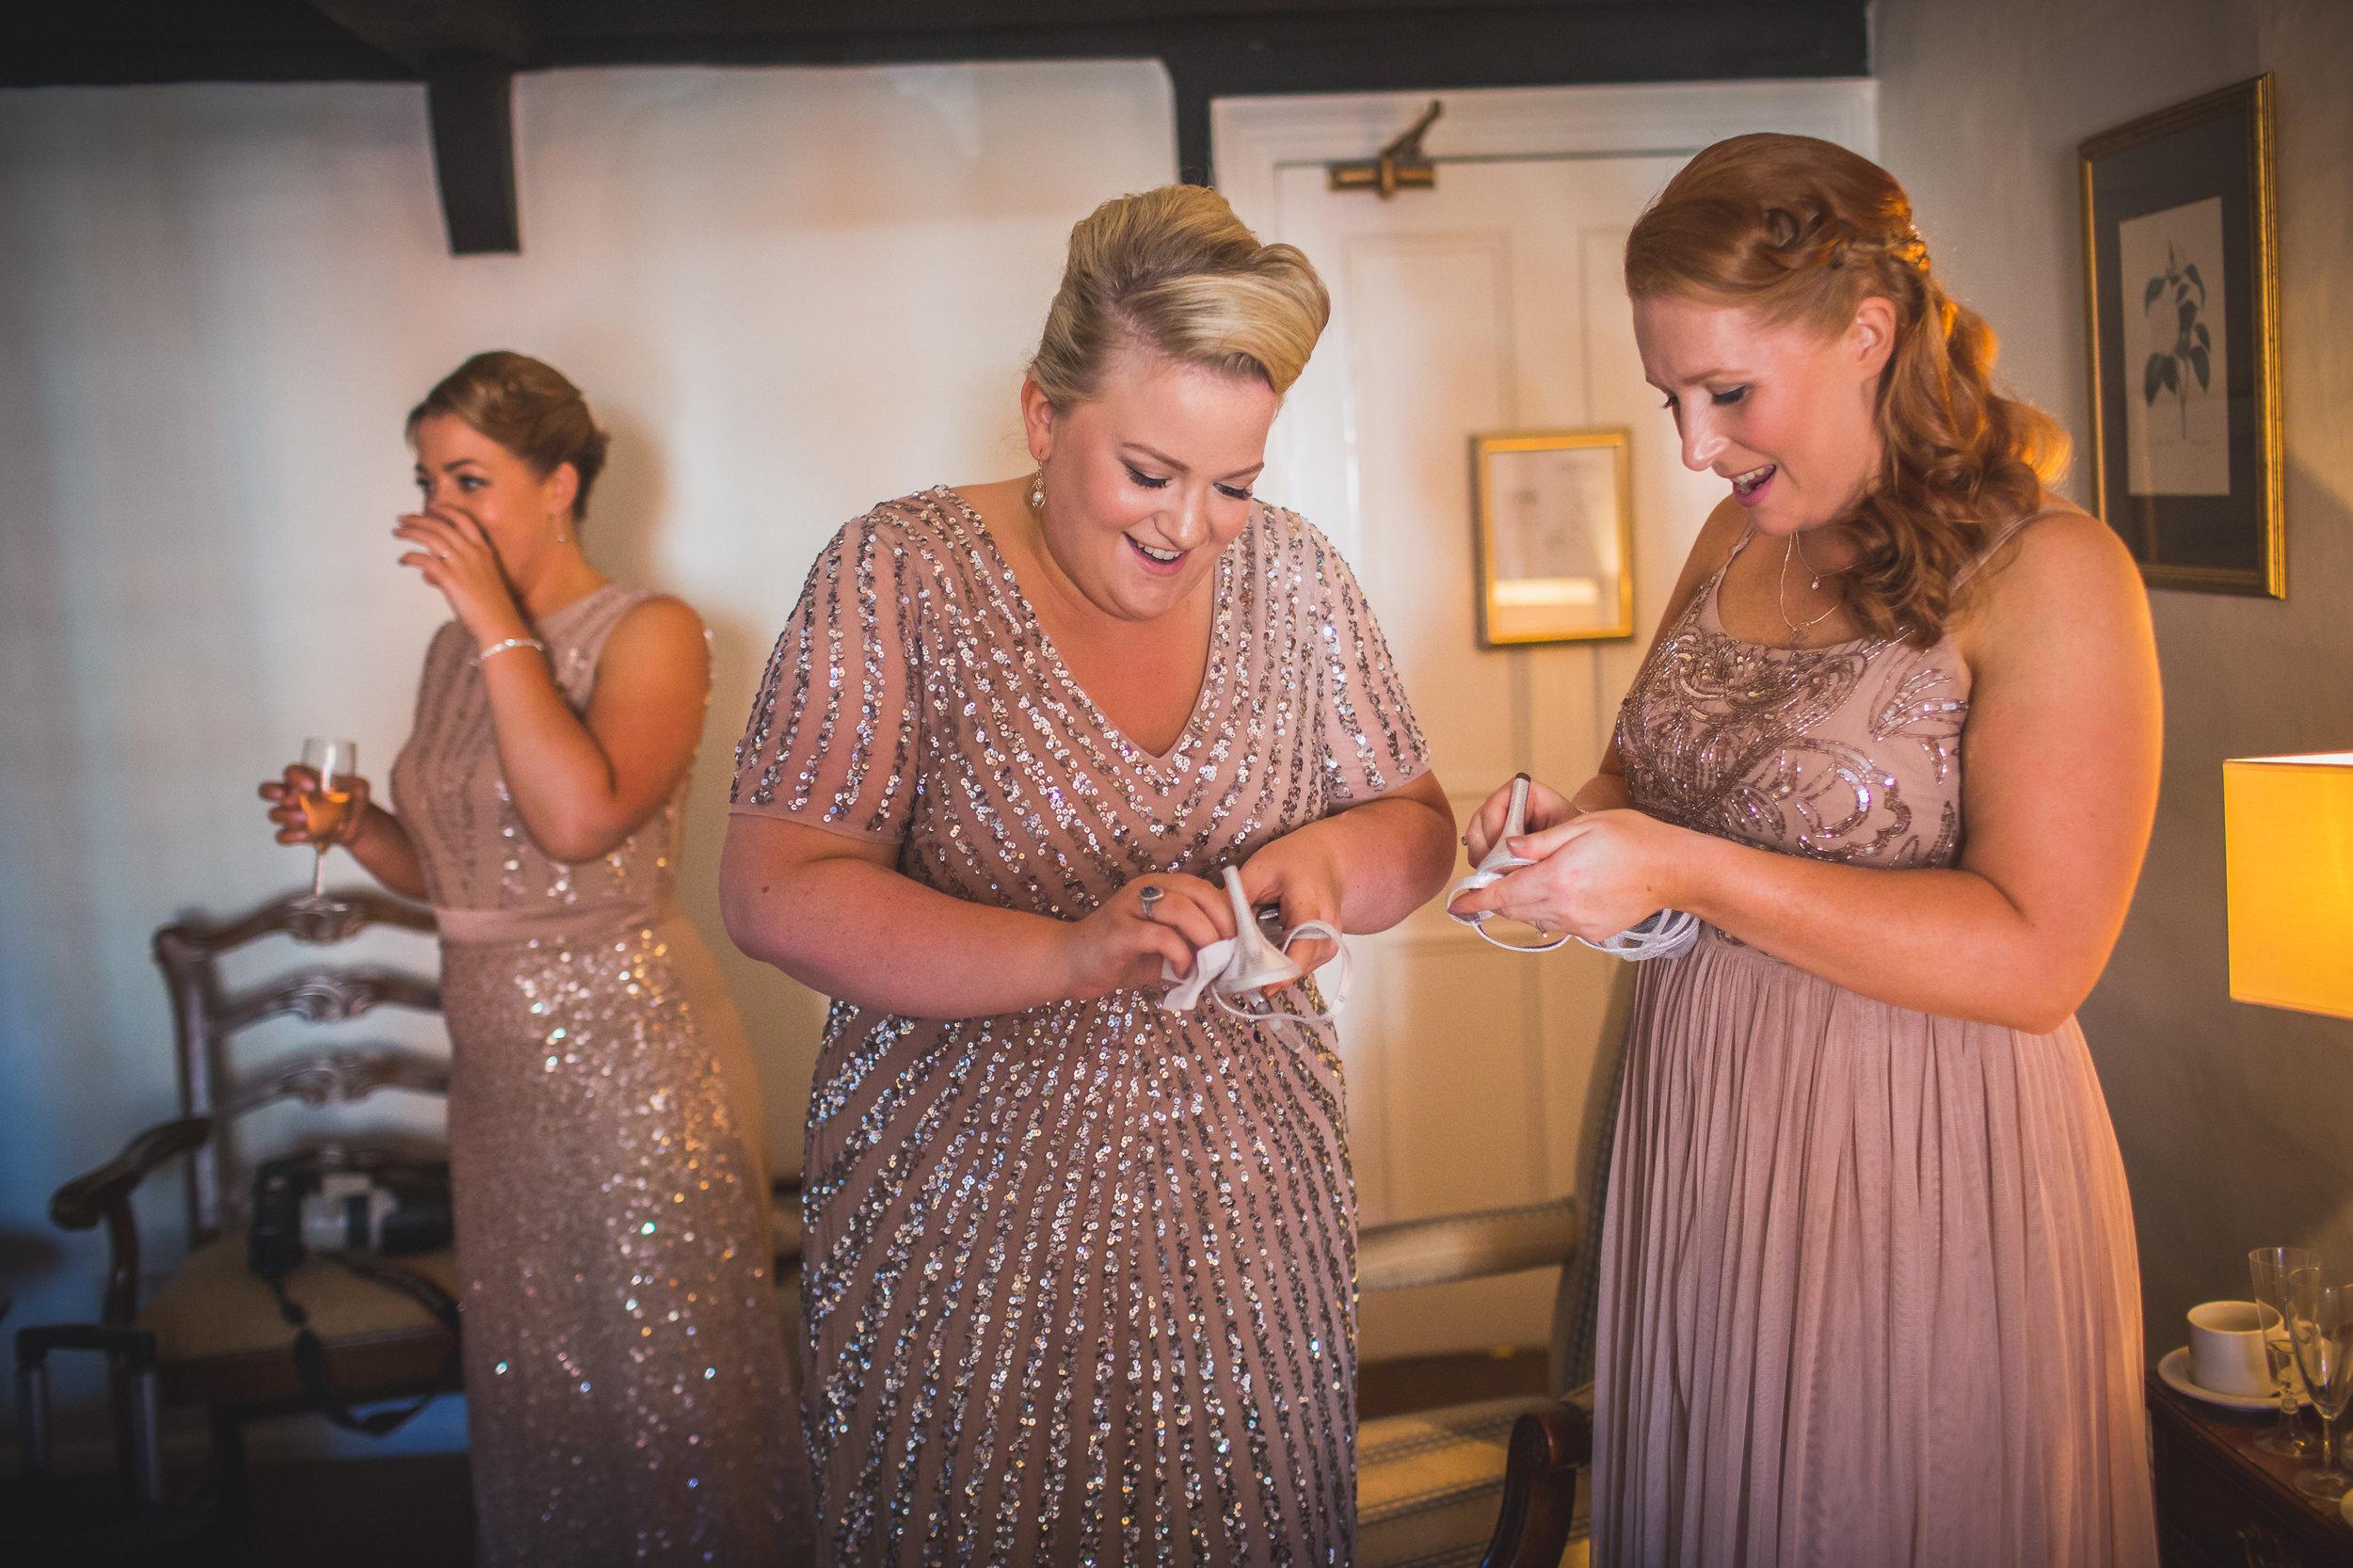 Grittenham Barn female wedding photographers west sussex petworth social-2.jpg